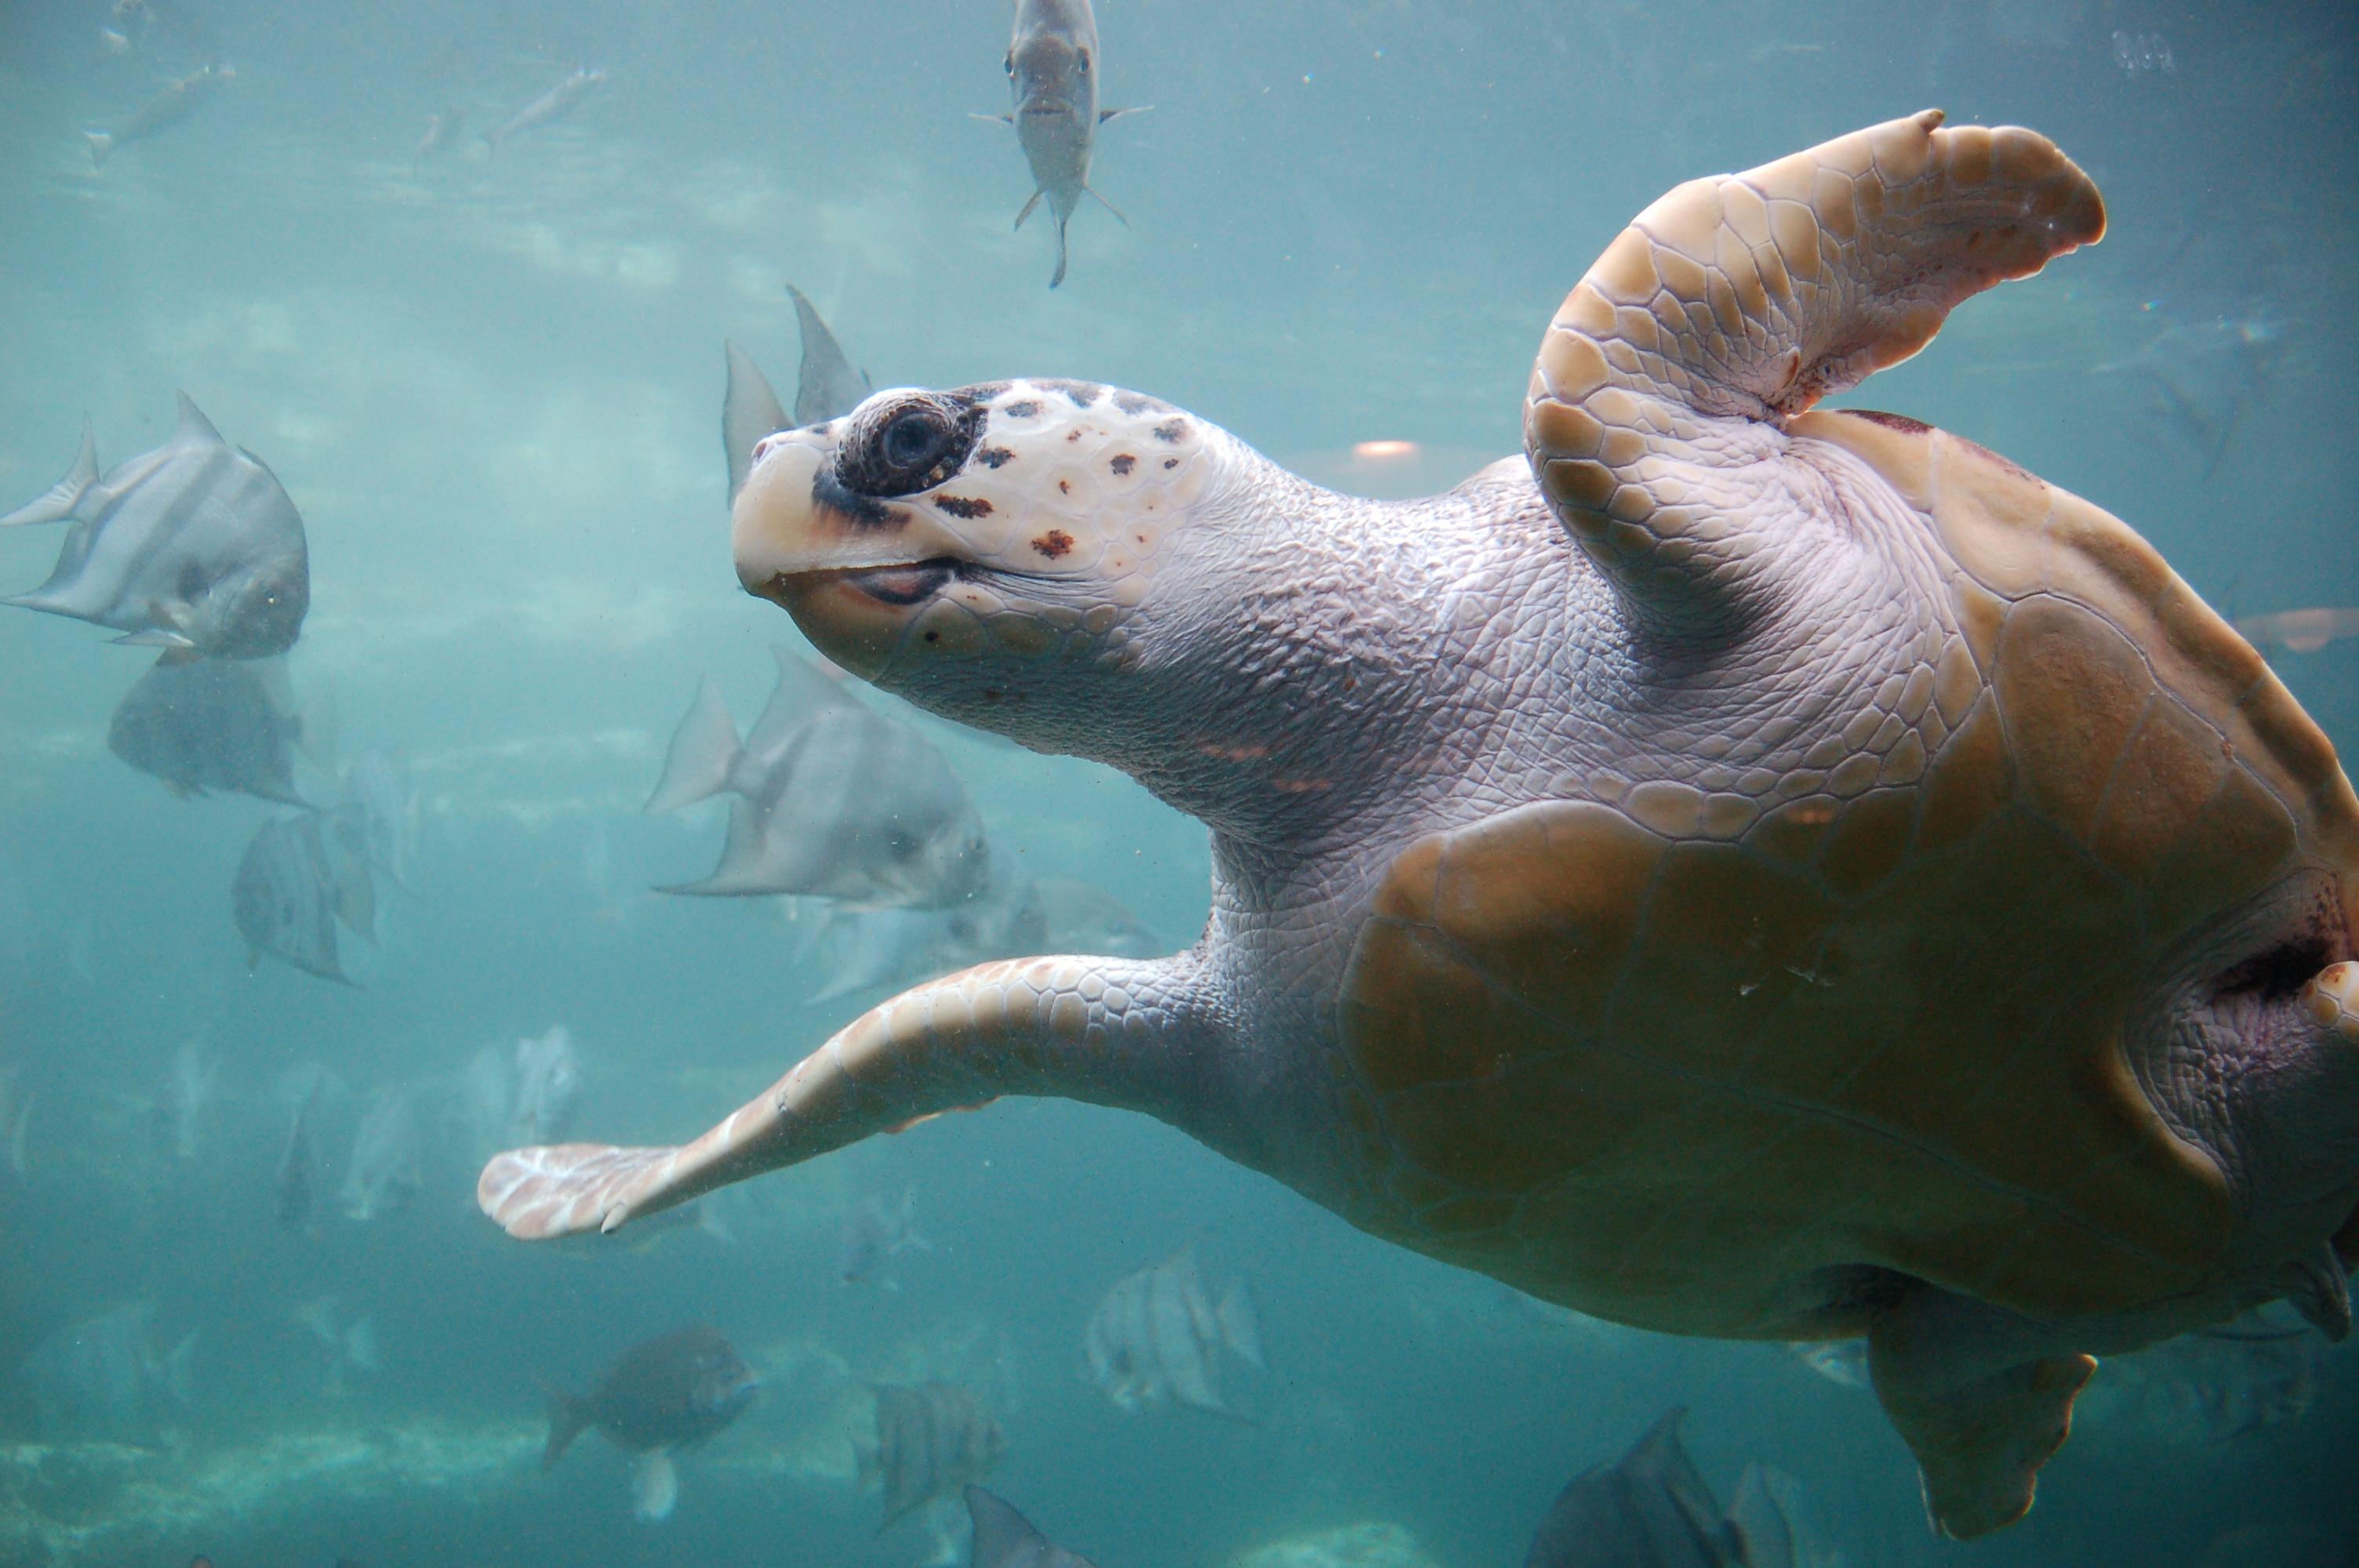 loggerhead sea turtle by ukanda Wikimedia Commons